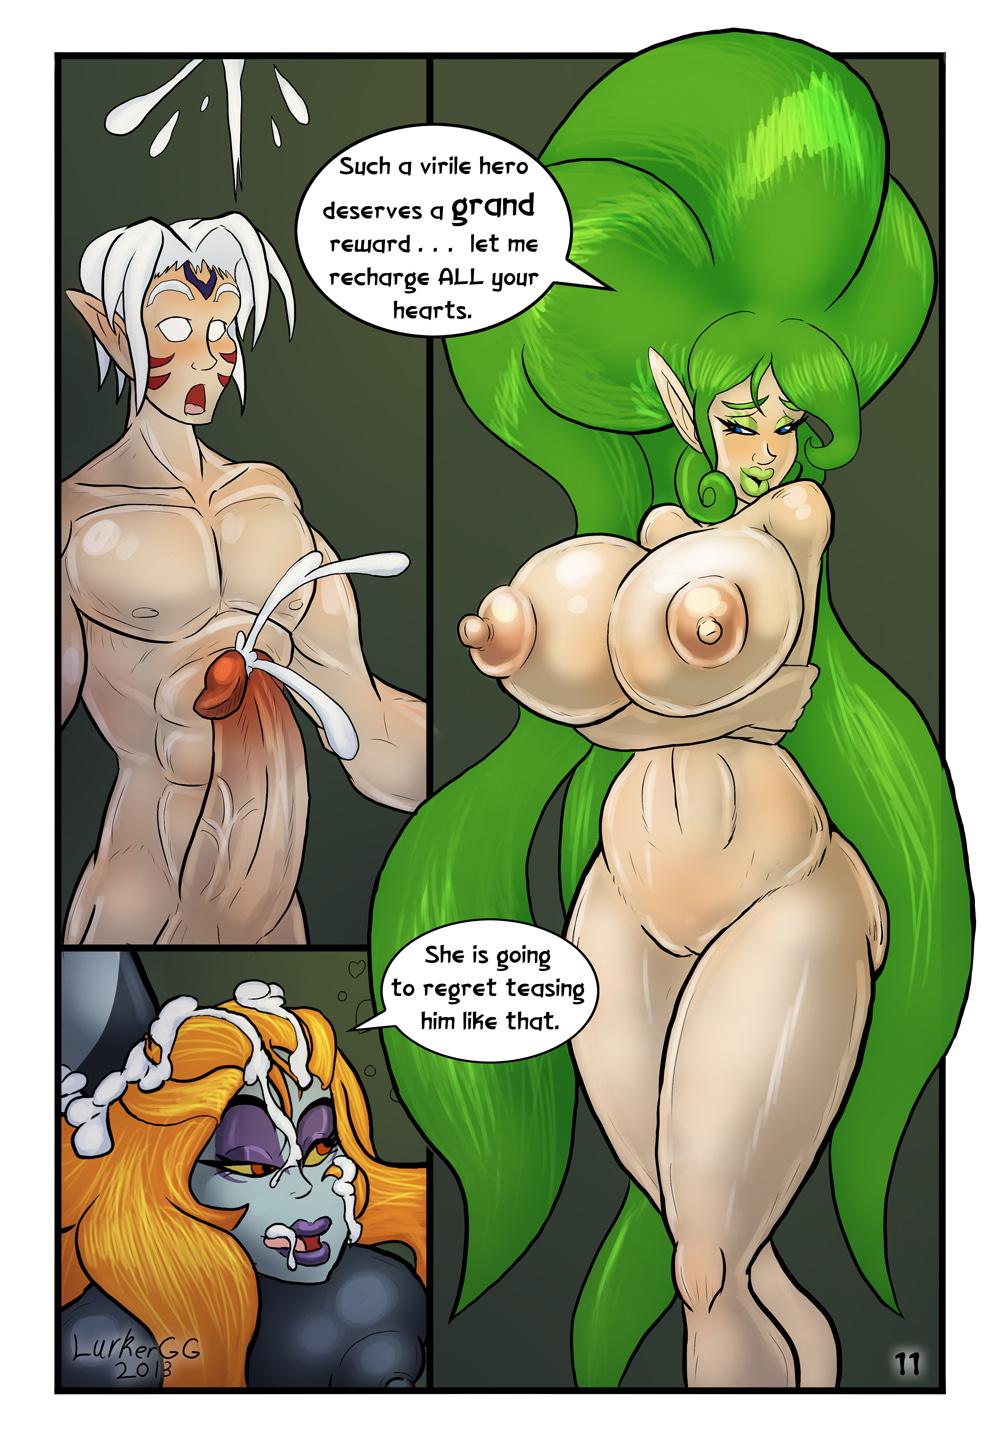 Sexy hot zelda porn big fairy anime images